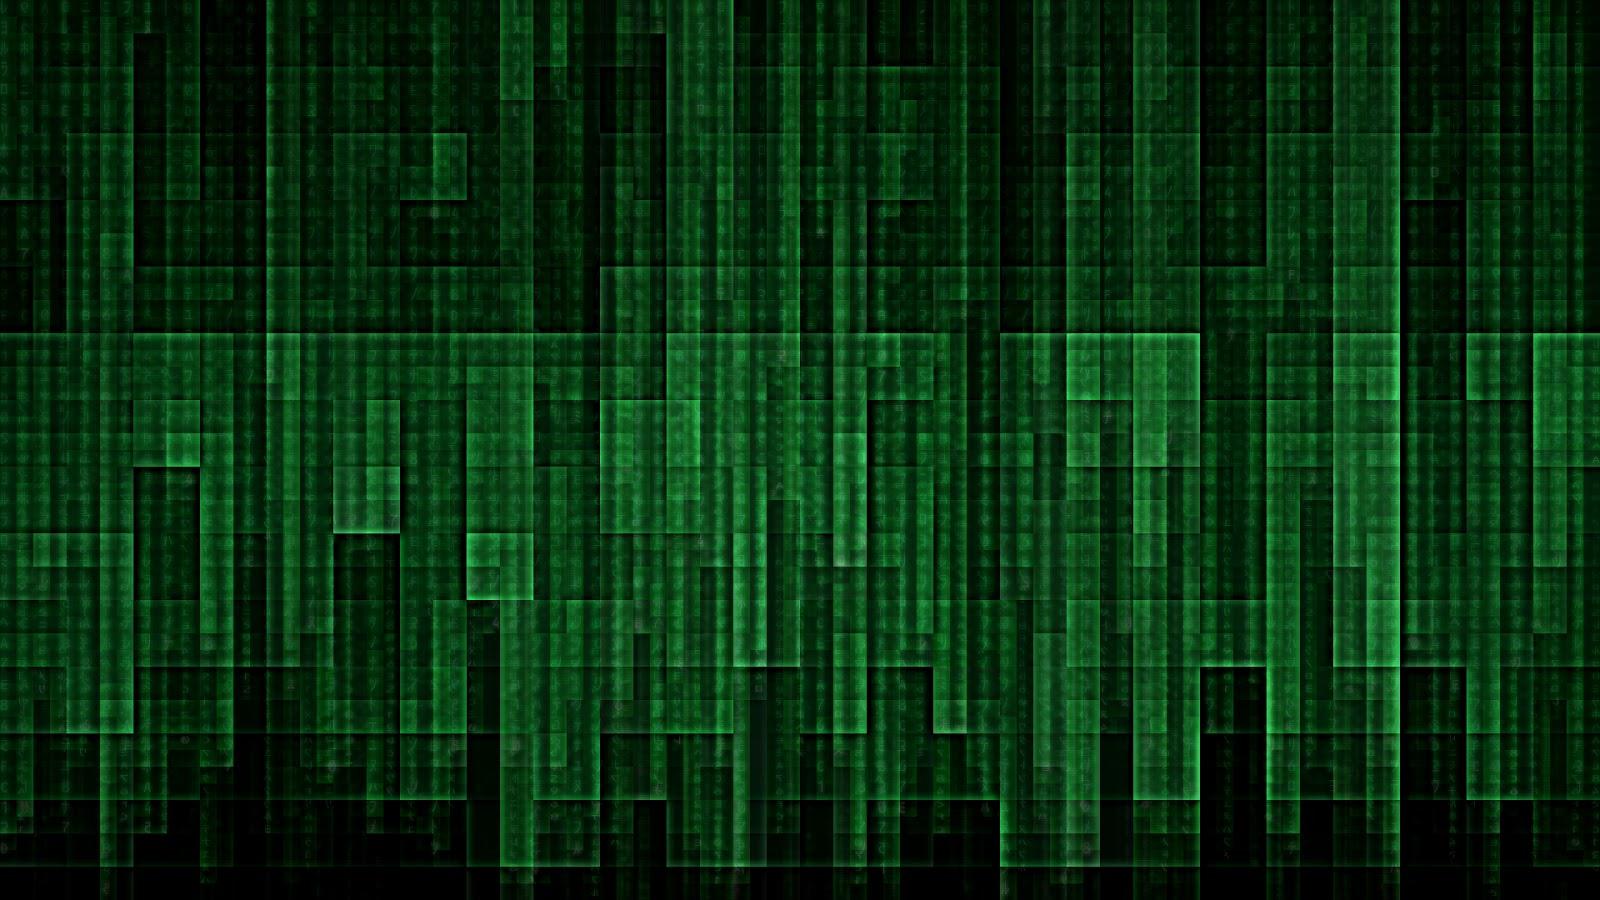 Hacking Wallpaper Gif Awesome looking matrix hacking 1600x900